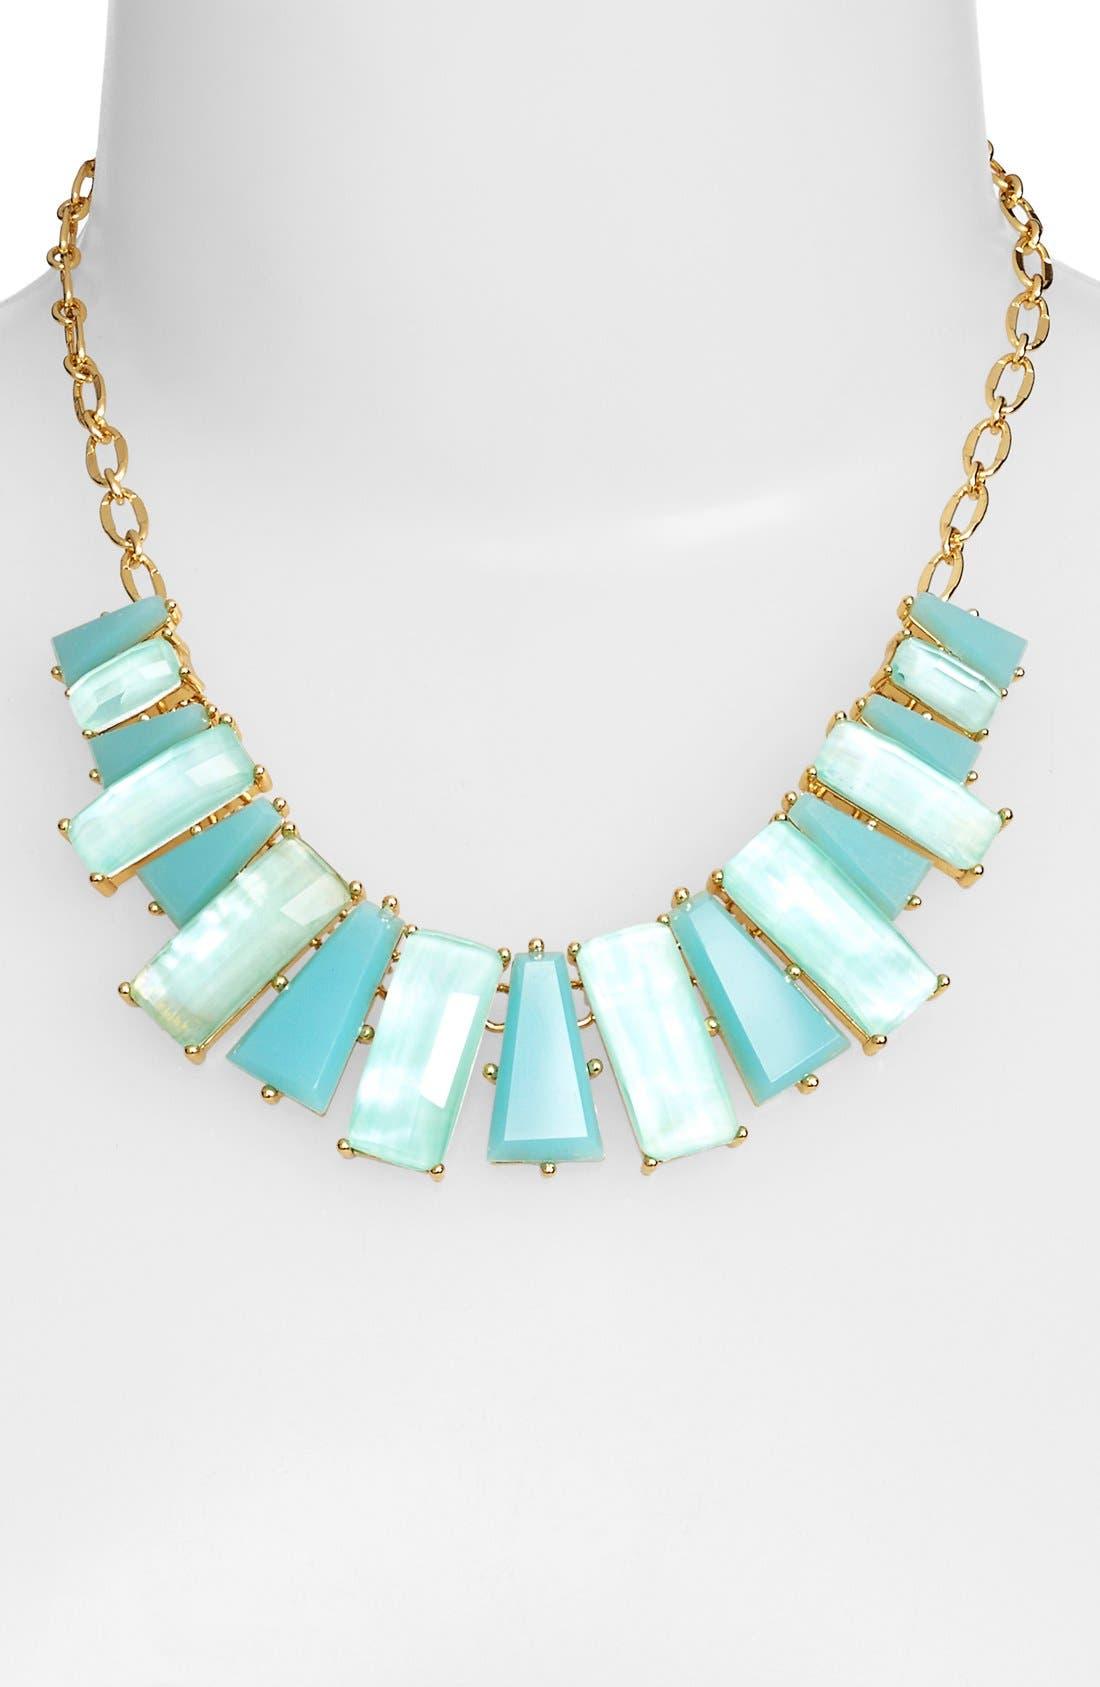 KATE SPADE NEW YORK,                             'beach gem' frontal necklace,                             Alternate thumbnail 2, color,                             405